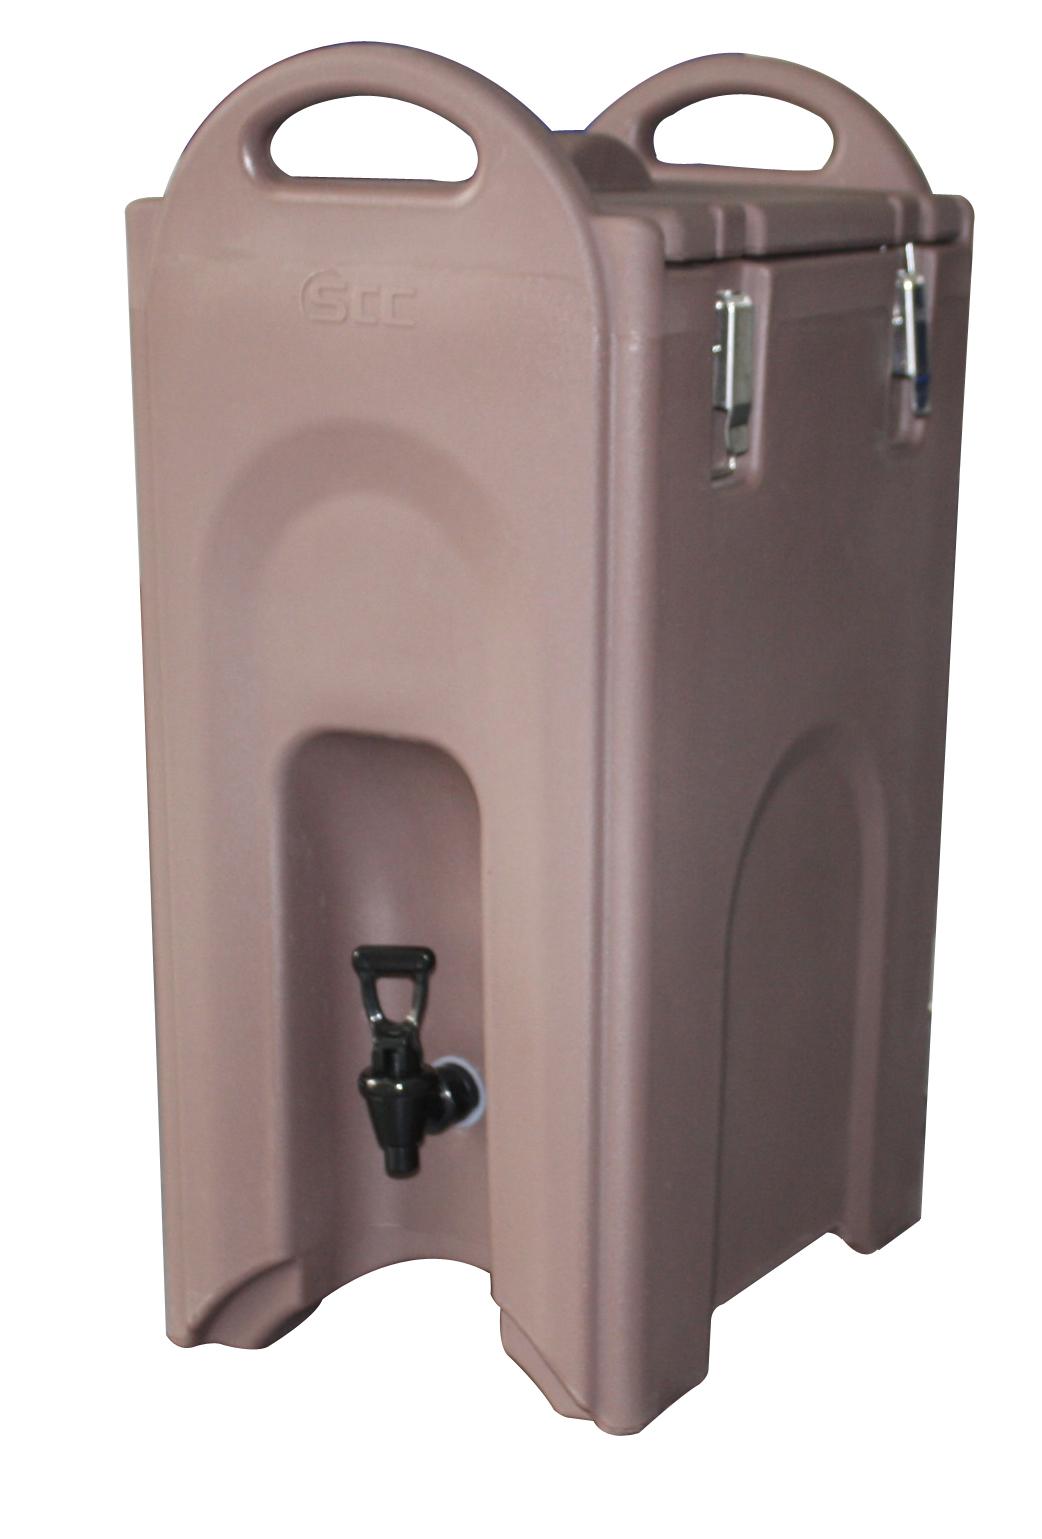 18L Beverage dispenser SB3-A18